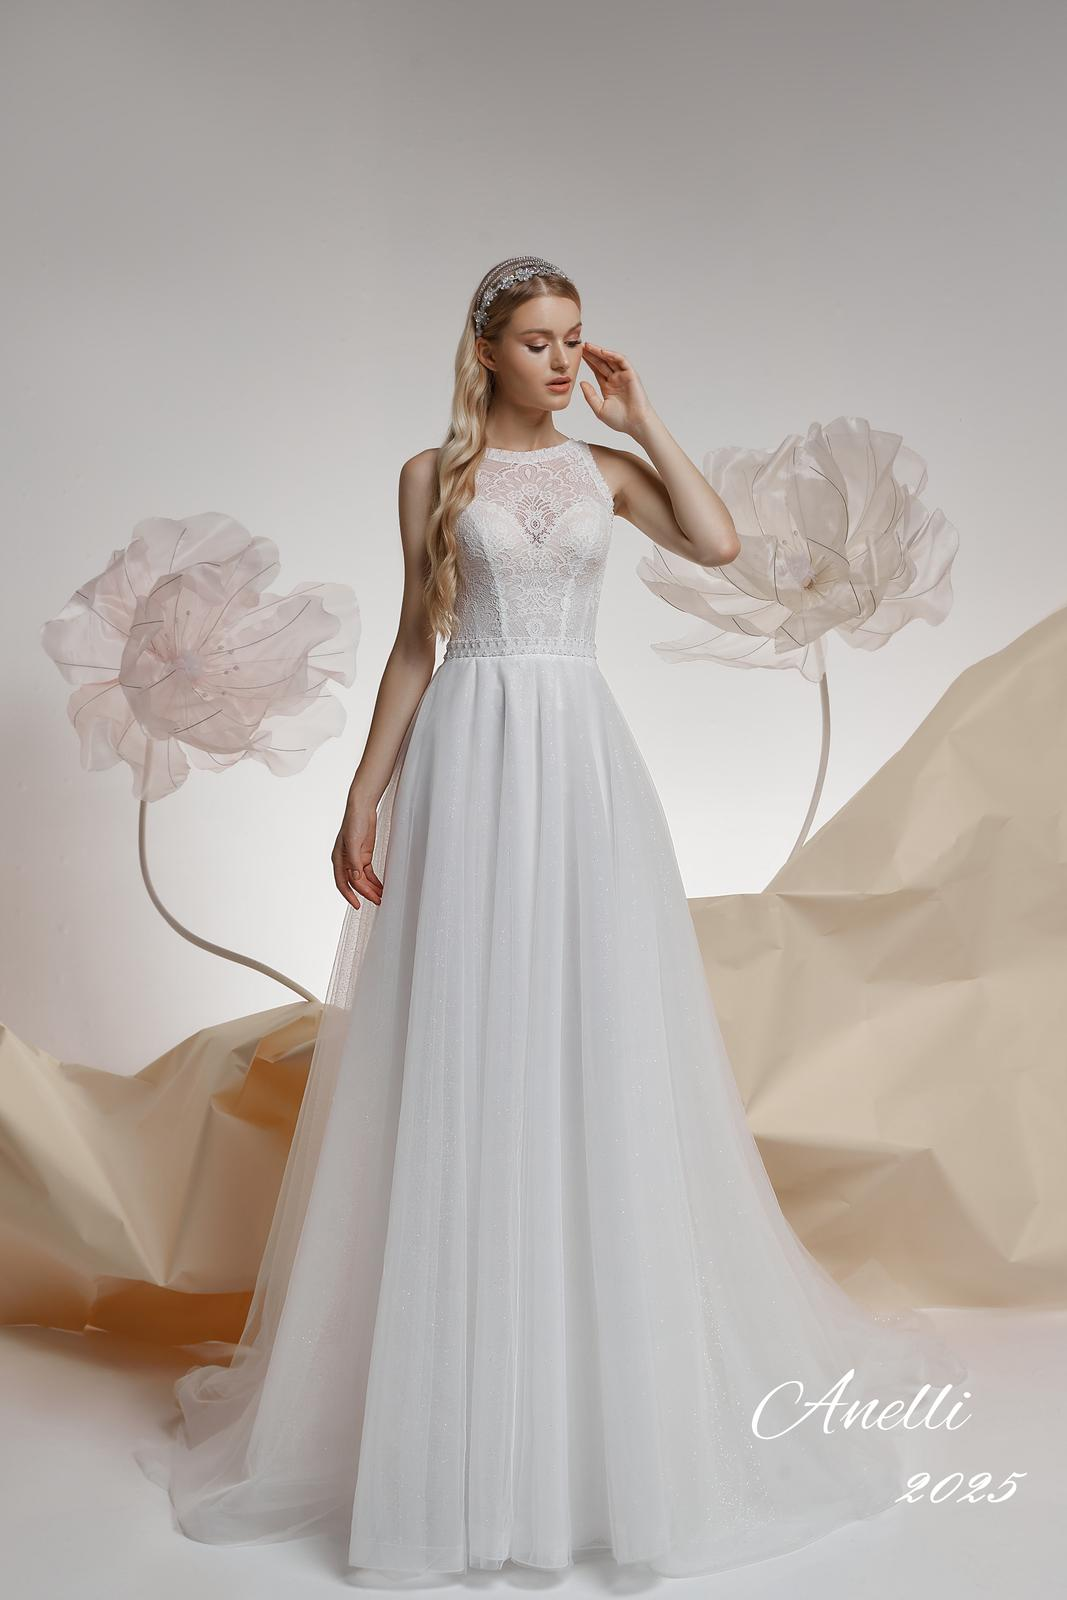 Svadobné šaty - Imagine 2025 - Obrázok č. 1